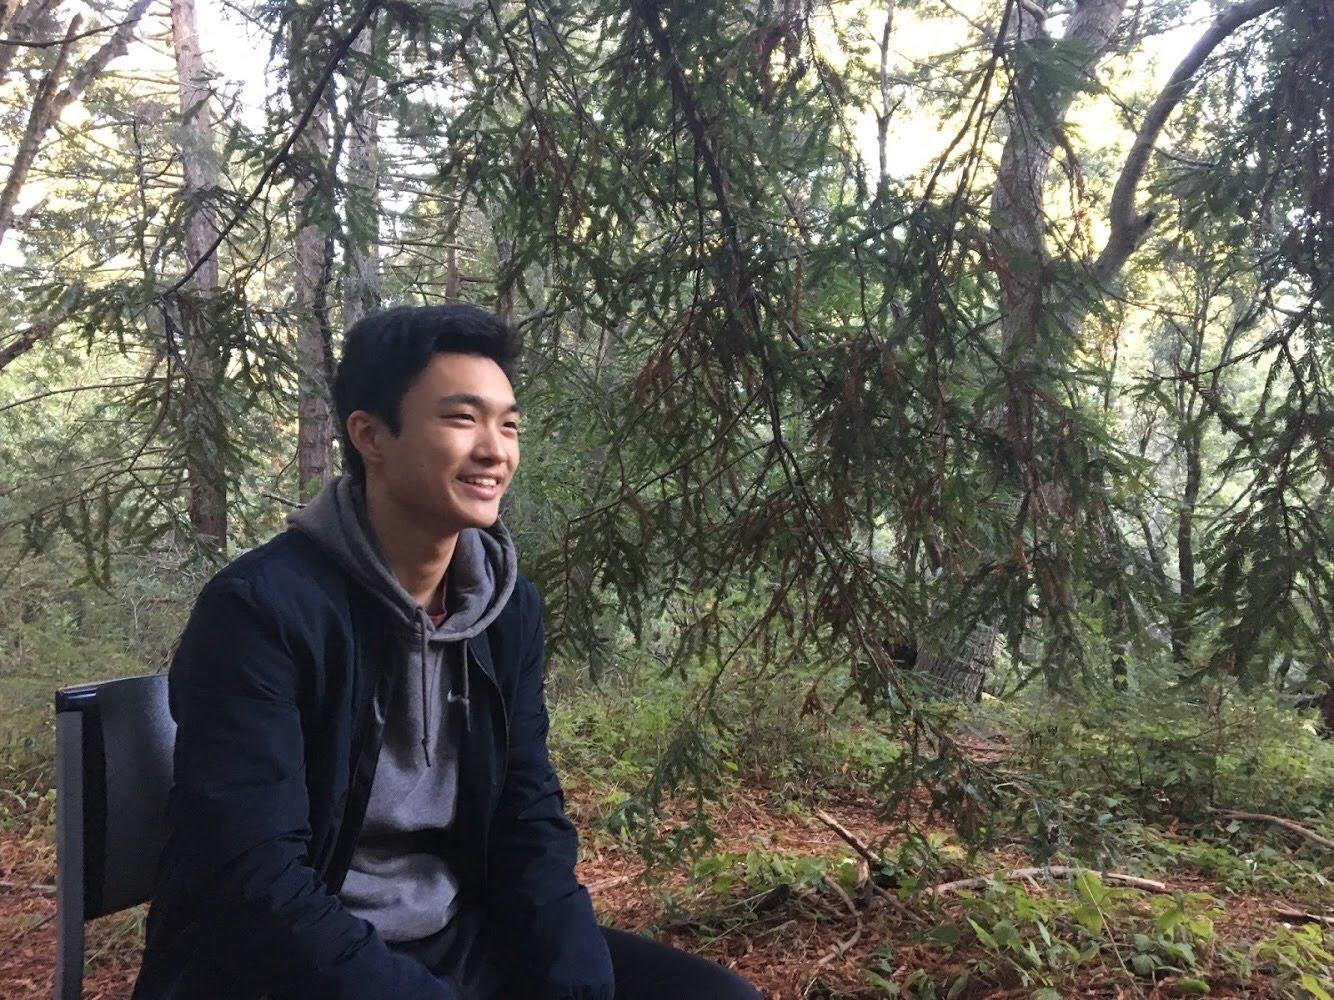 Kevin Yuan   18, studying computer science at UC Berkeley